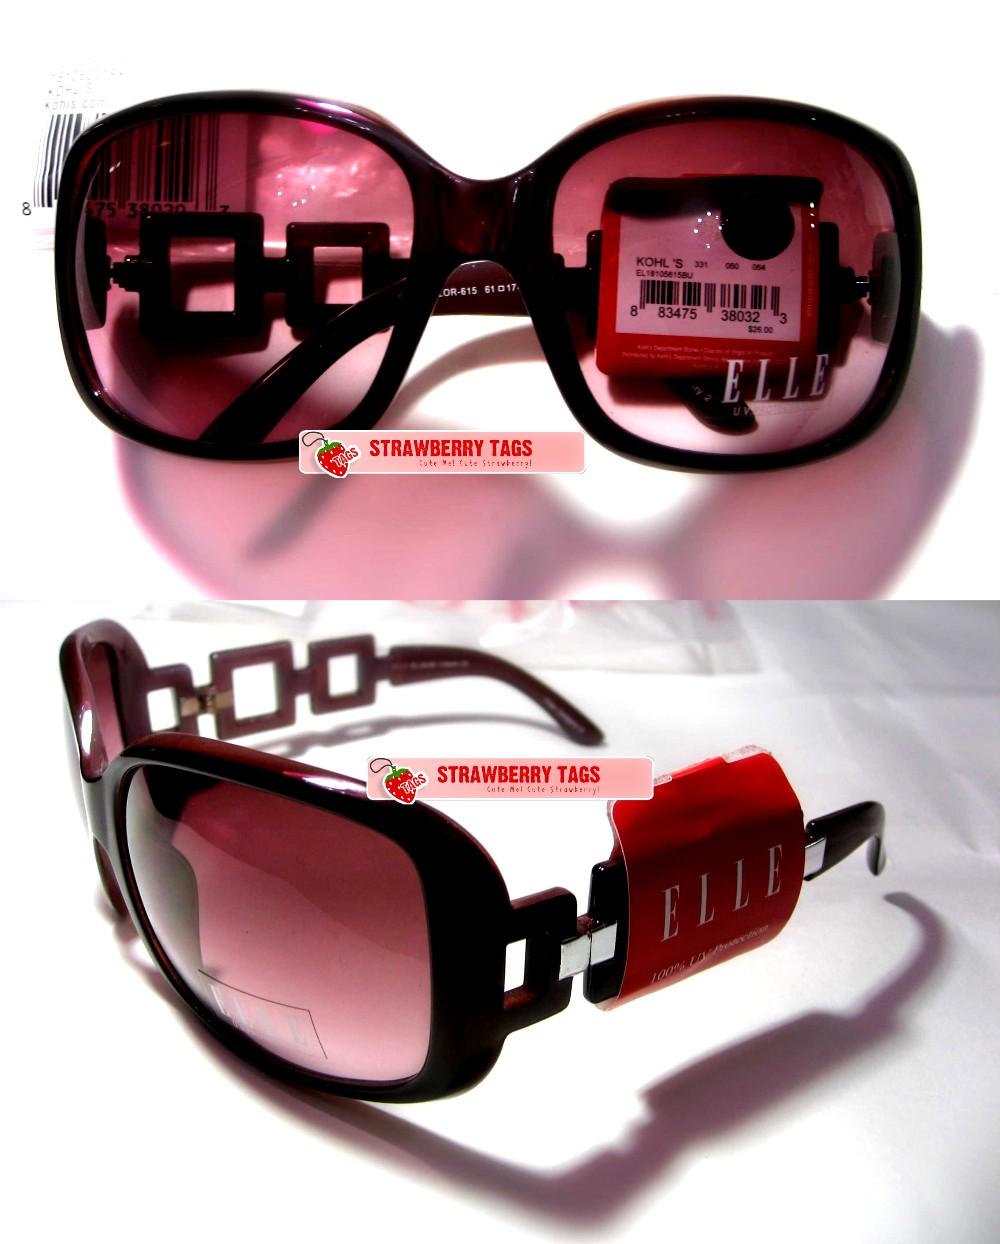 77b8173fe17eb StrawBerry TaGs~  ELLE™ Square-Link Sunglasses (in Burgandy)